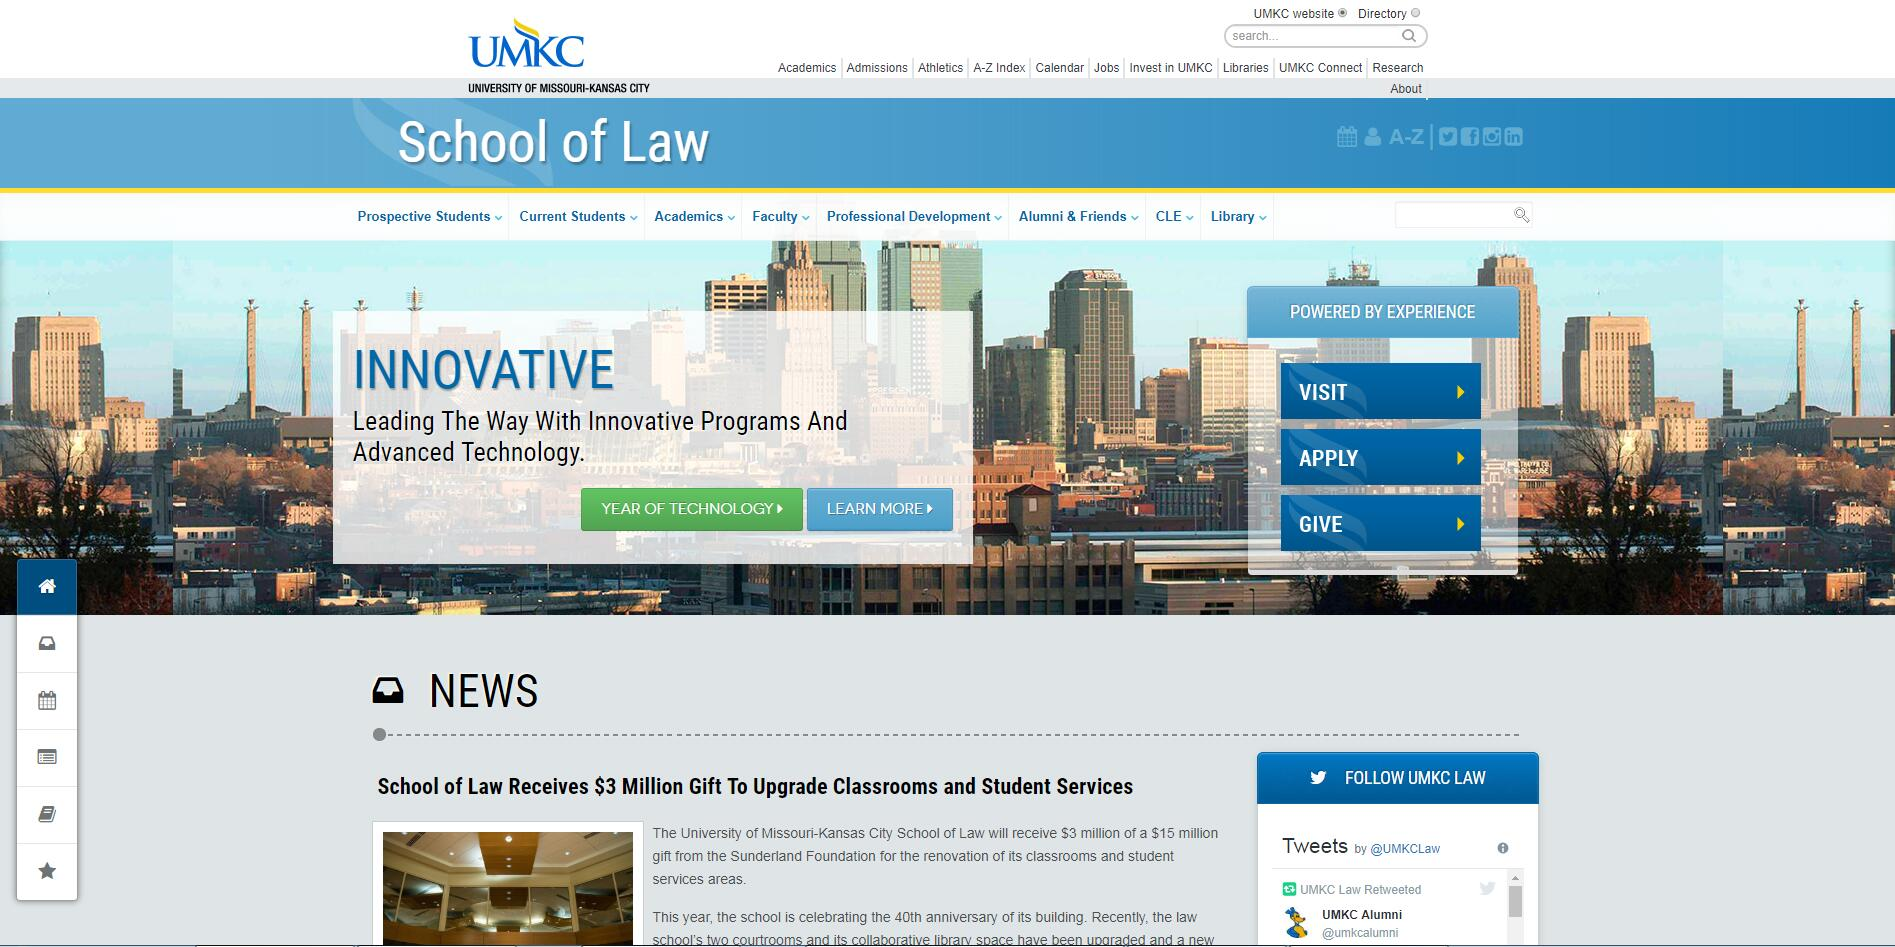 The School of Law at University of Missouri--Kansas City